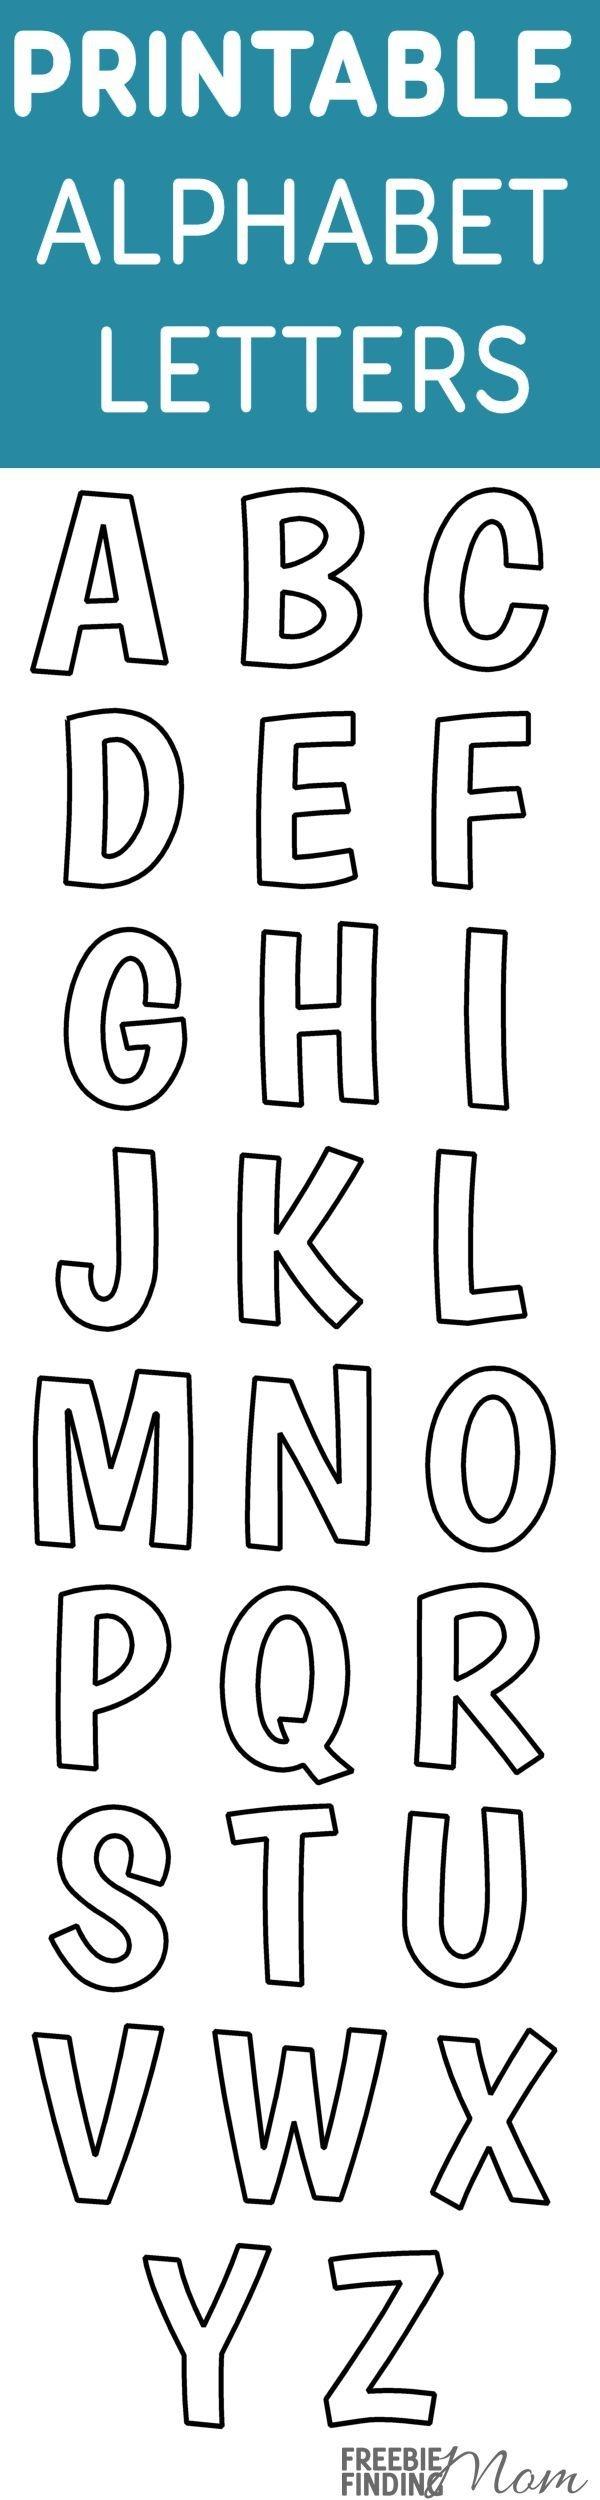 Printable Free Alphabet Templates   Diy Ideas   Alphabet Templates - Free Printable Alphabet Stencils To Cut Out